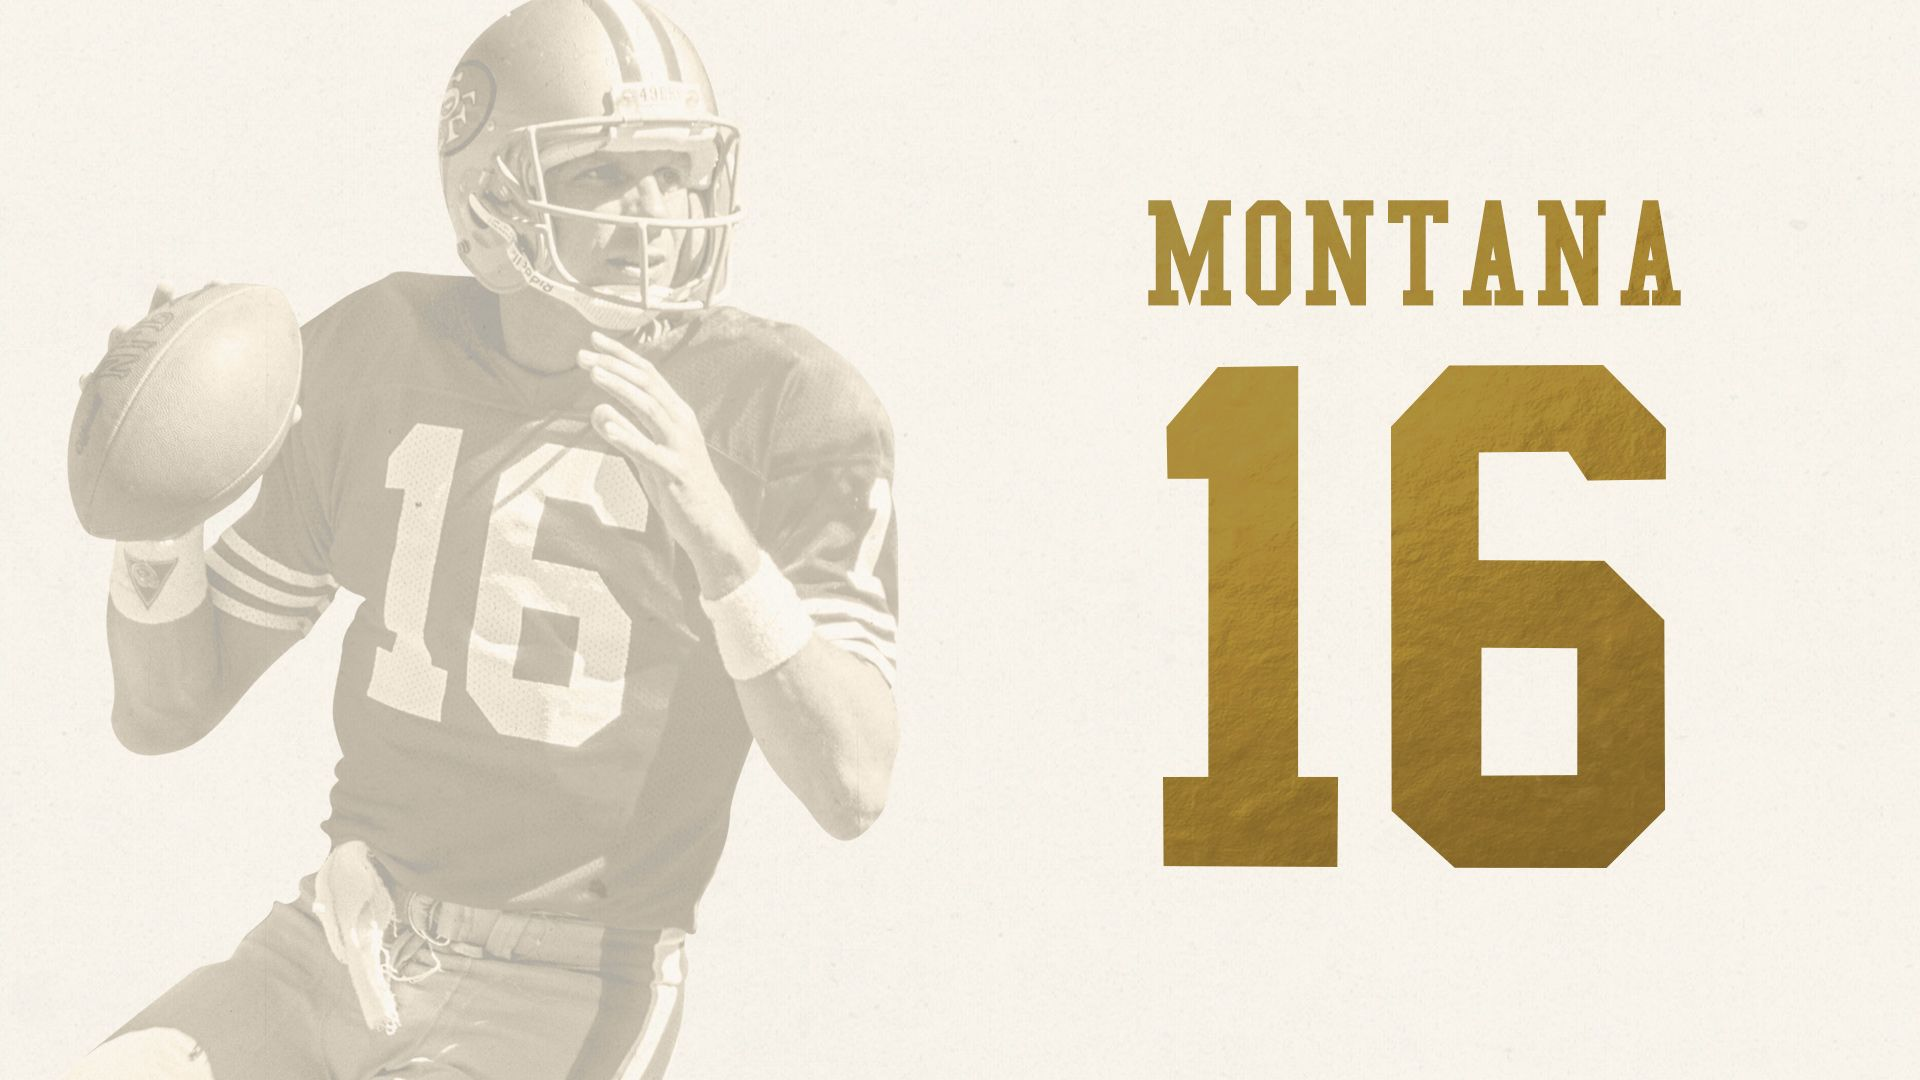 Joe Montana, QB (1979-1992)